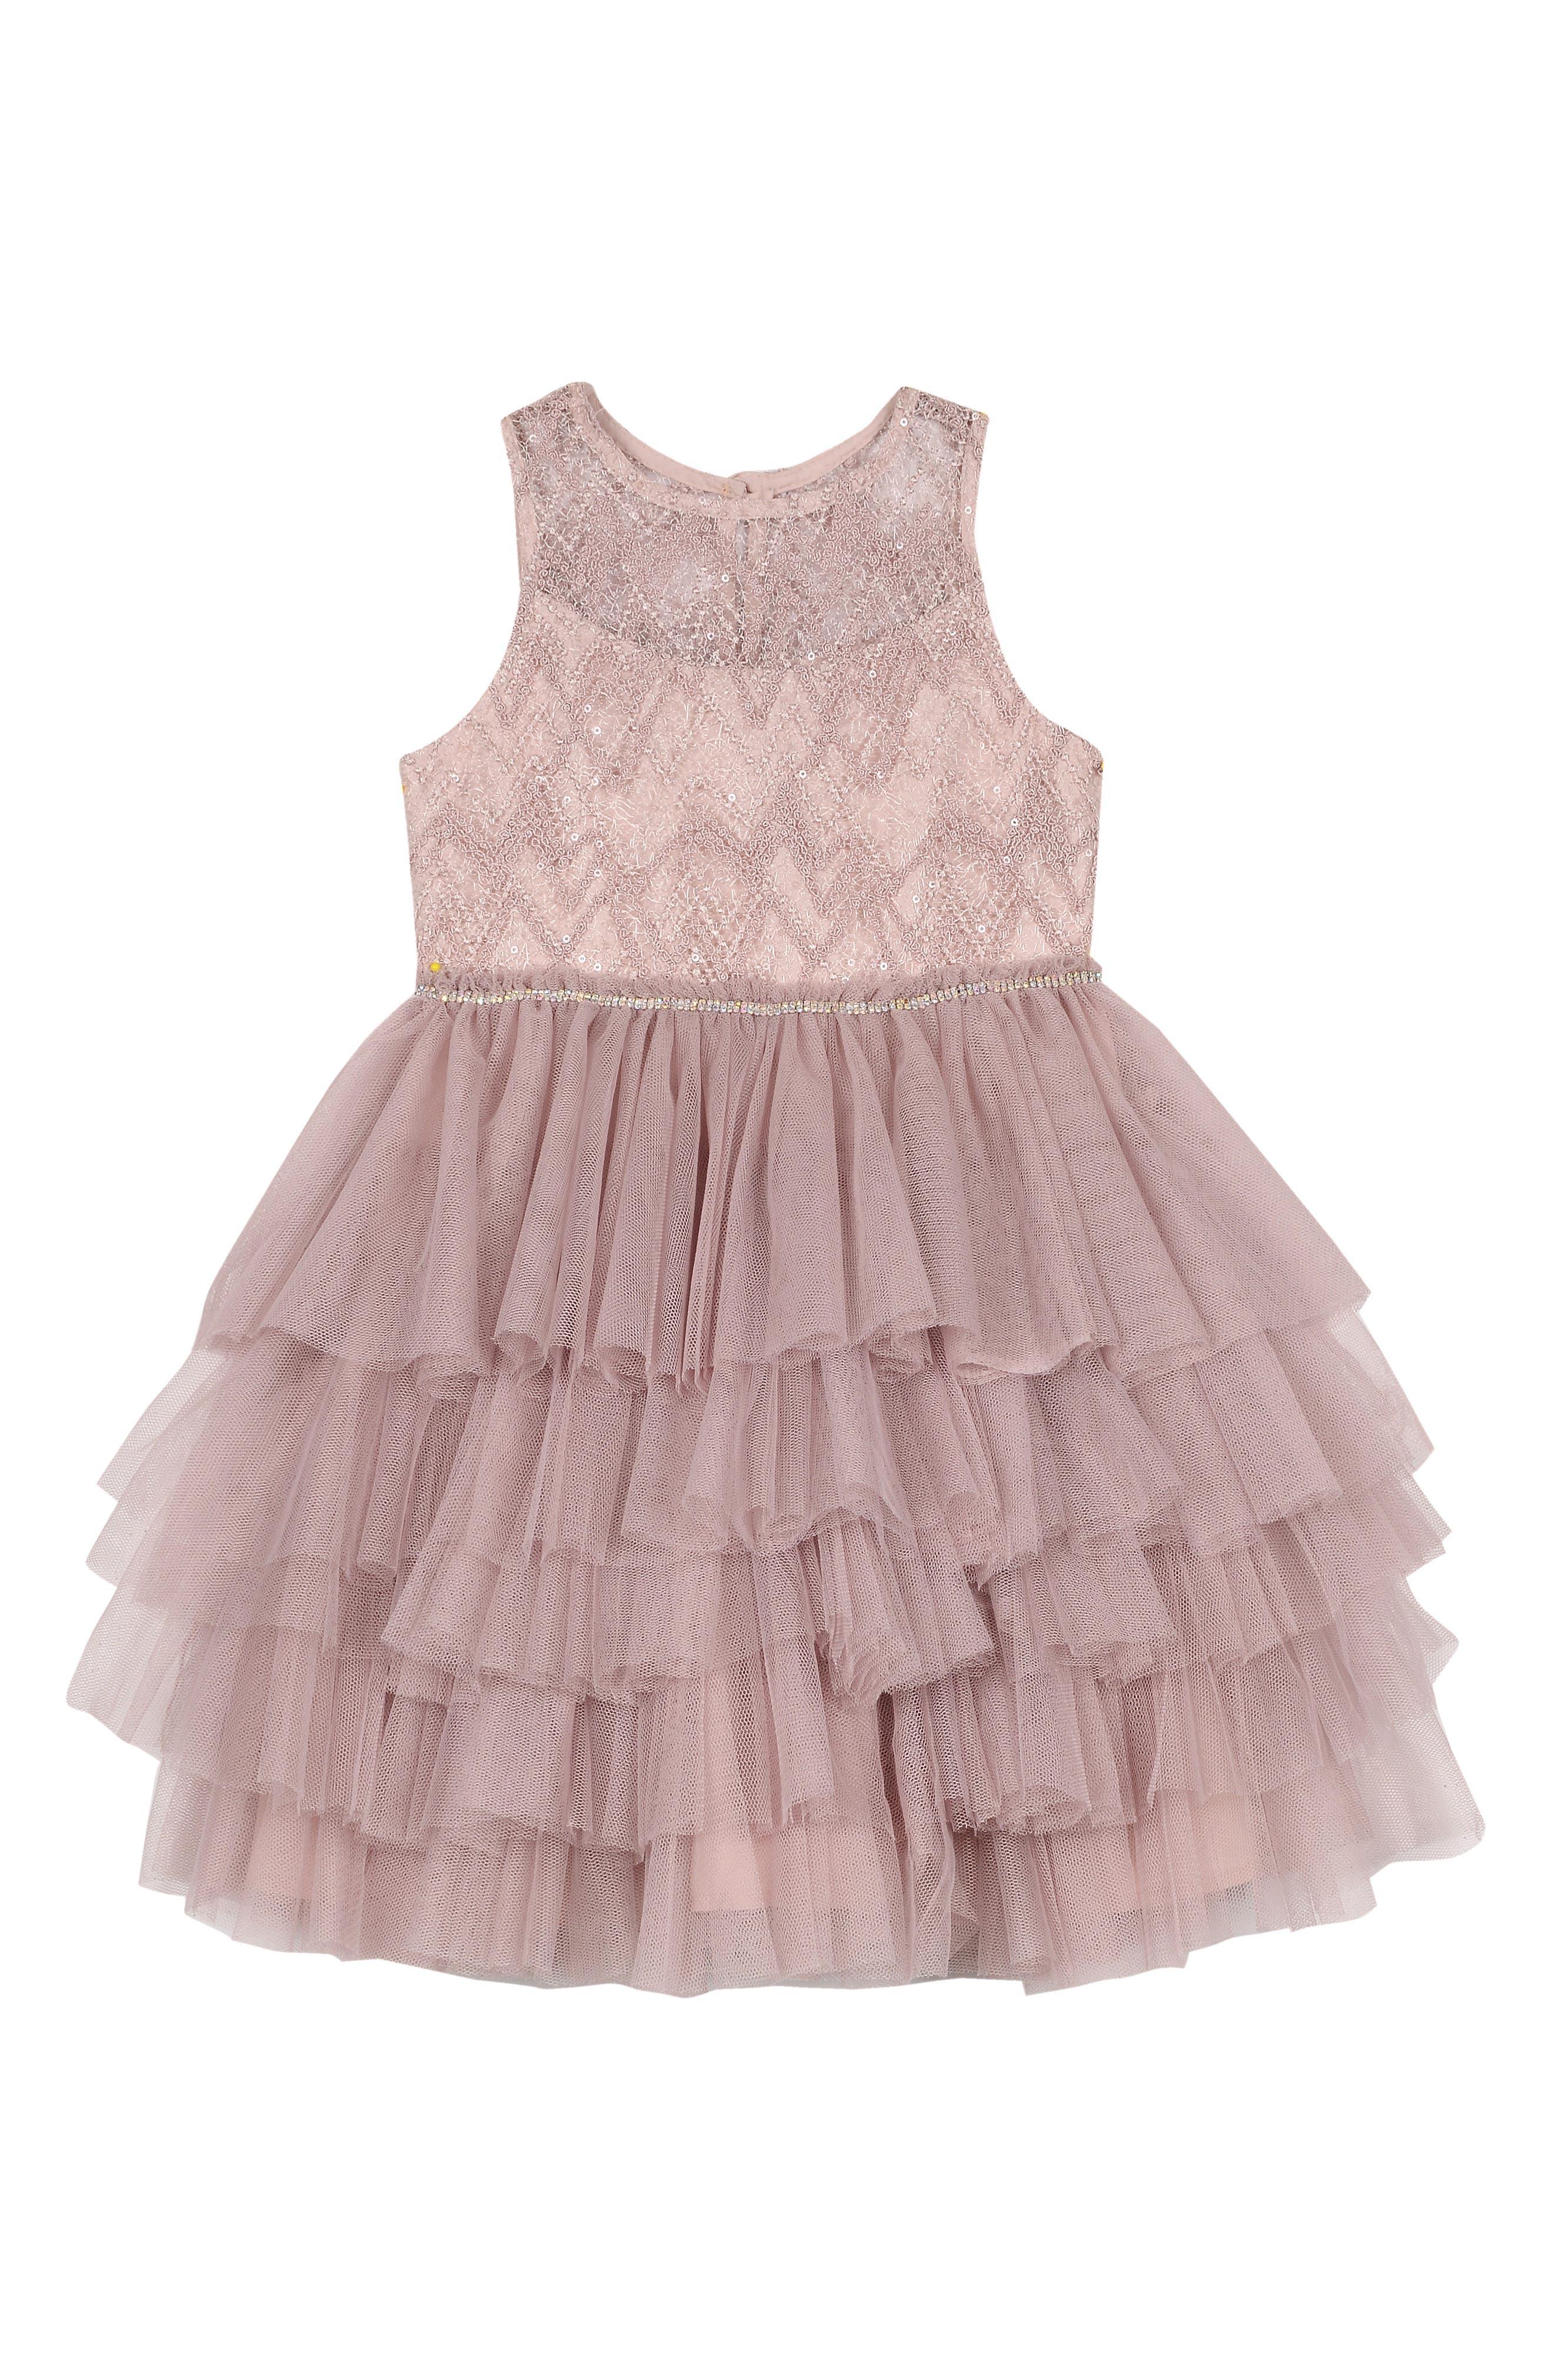 Girls Badgley Mischka Beaded Tulle Party Dress